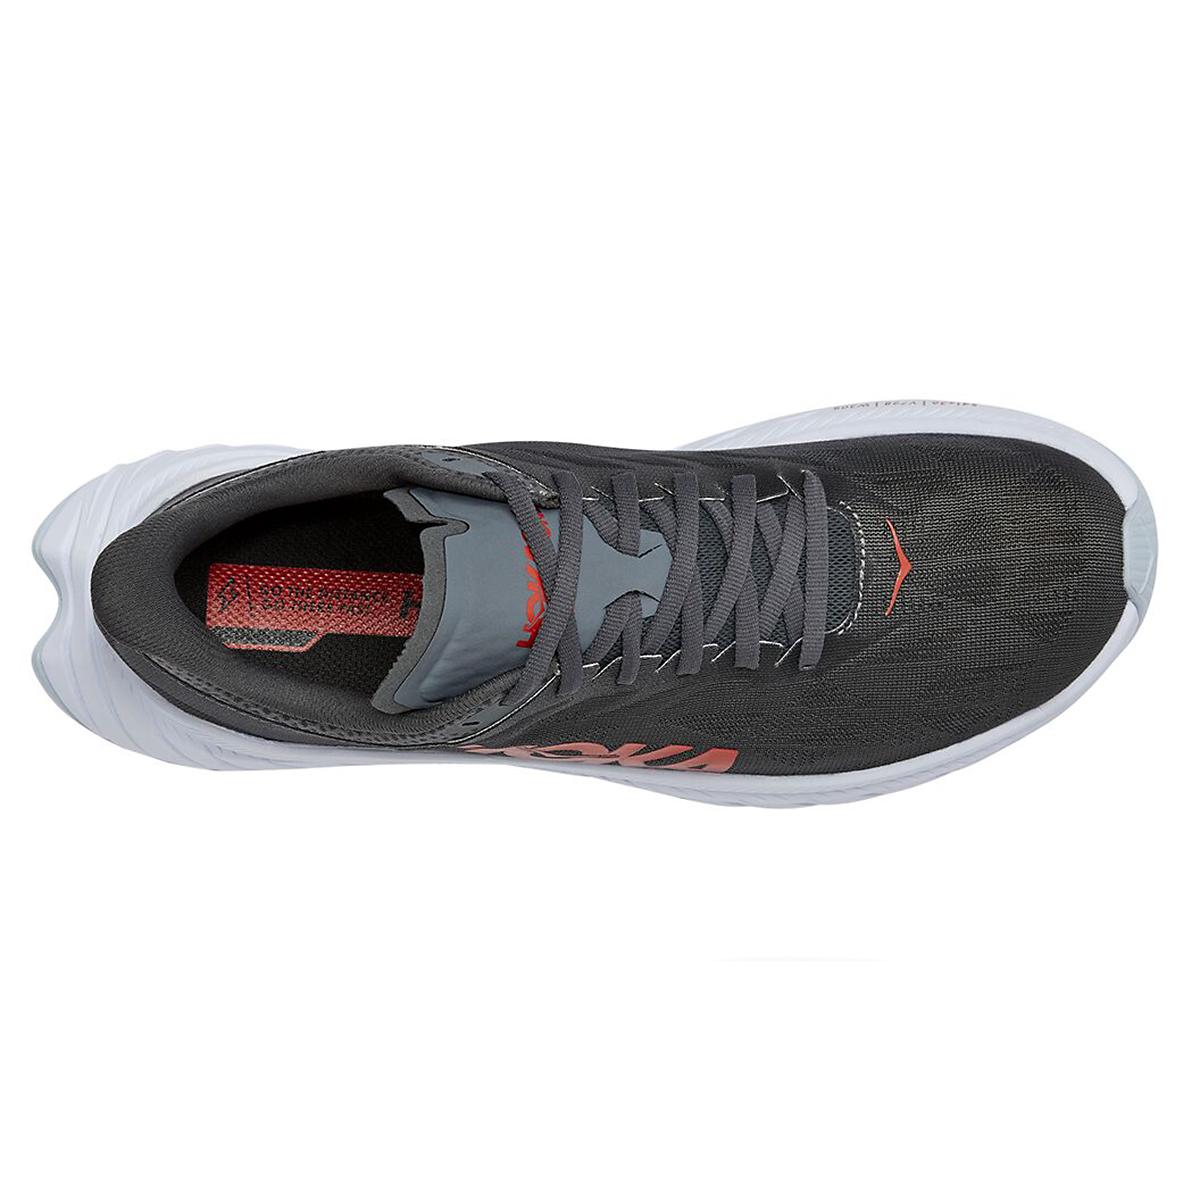 Men's Hoka One One Carbon X 2 Running Shoe - Color: Dark Shadow/Fiesta - Size: 7 - Width: Regular, Dark Shadow/Fiesta, large, image 3